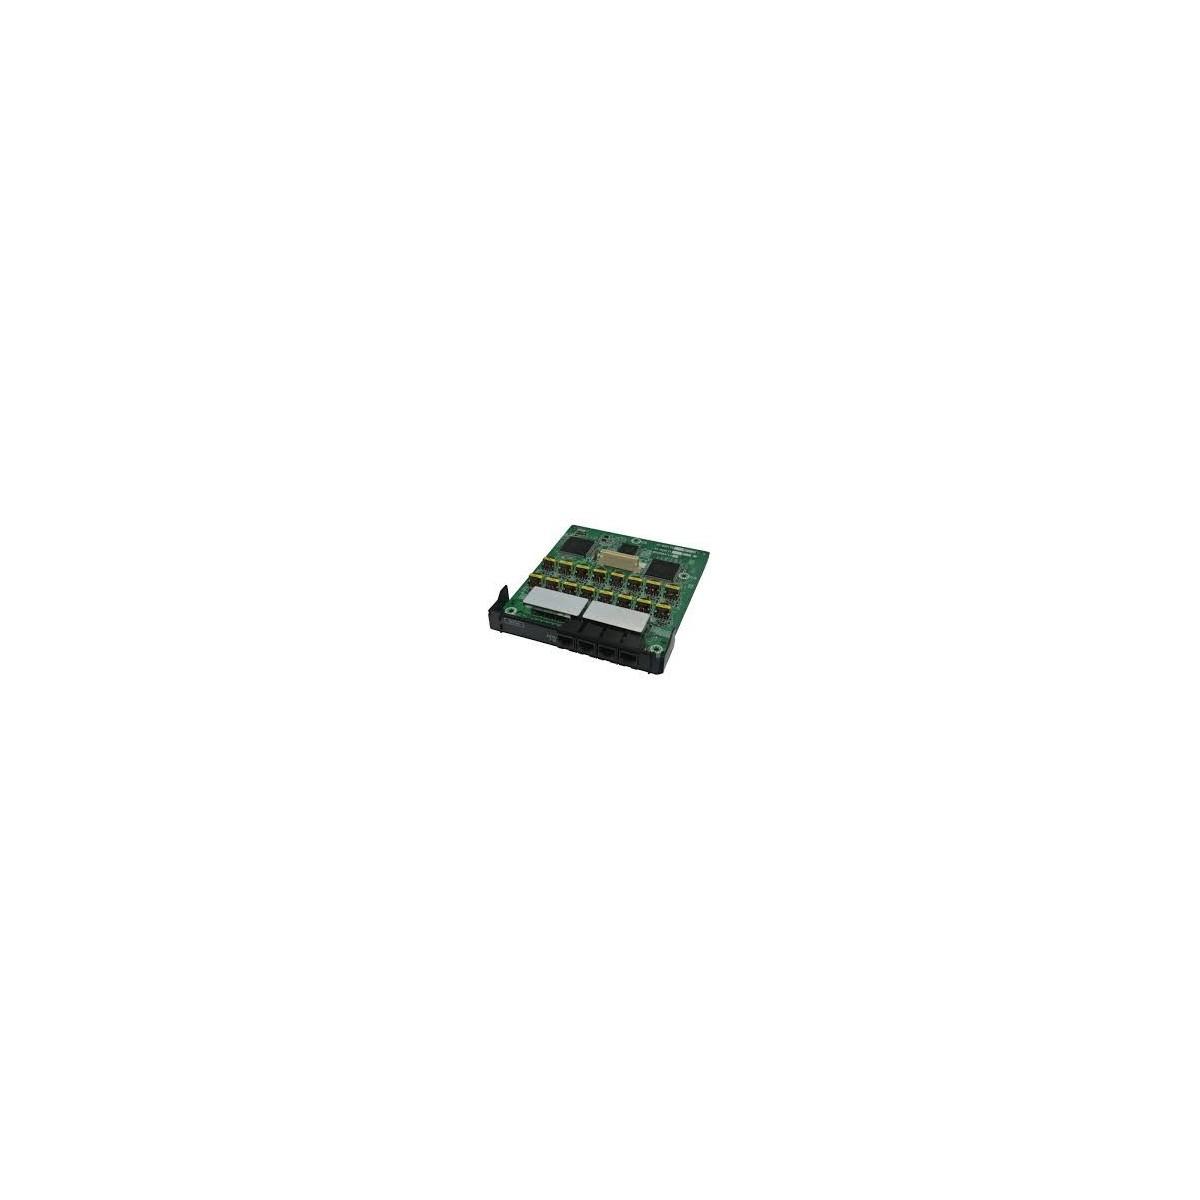 Scheda KX‐NS5172X panasonic 16 interni digitali